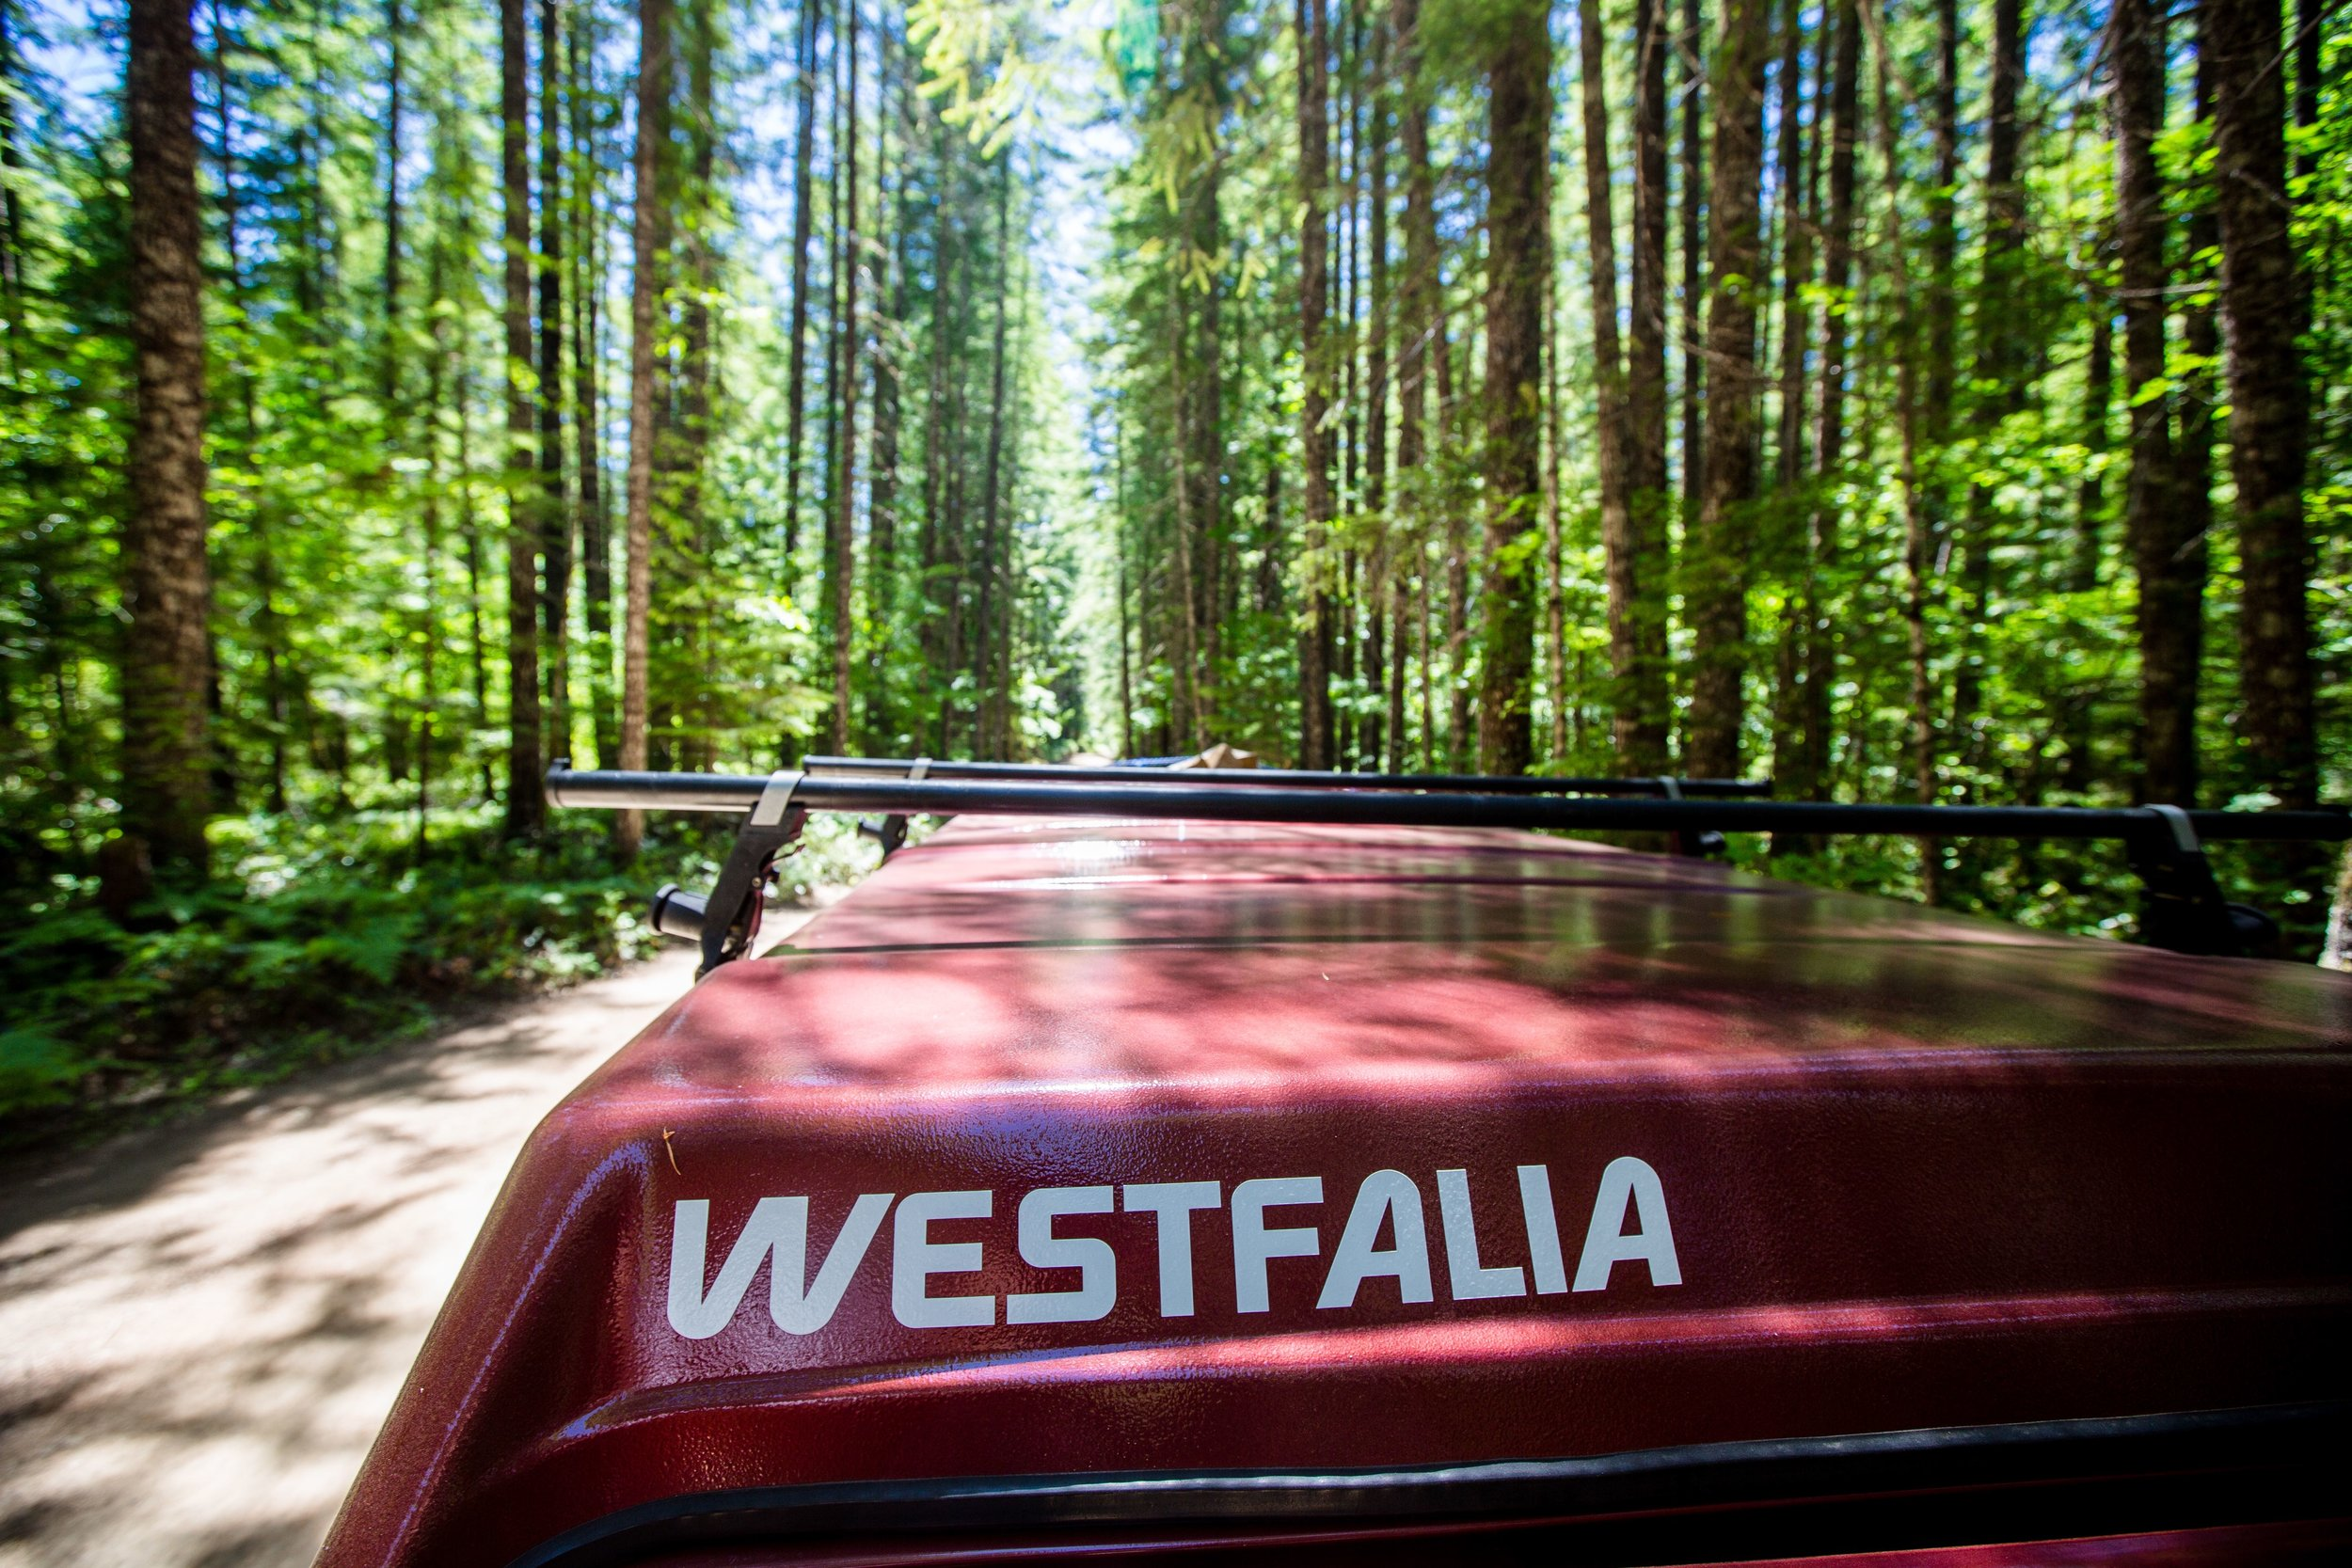 westfalia.jpg